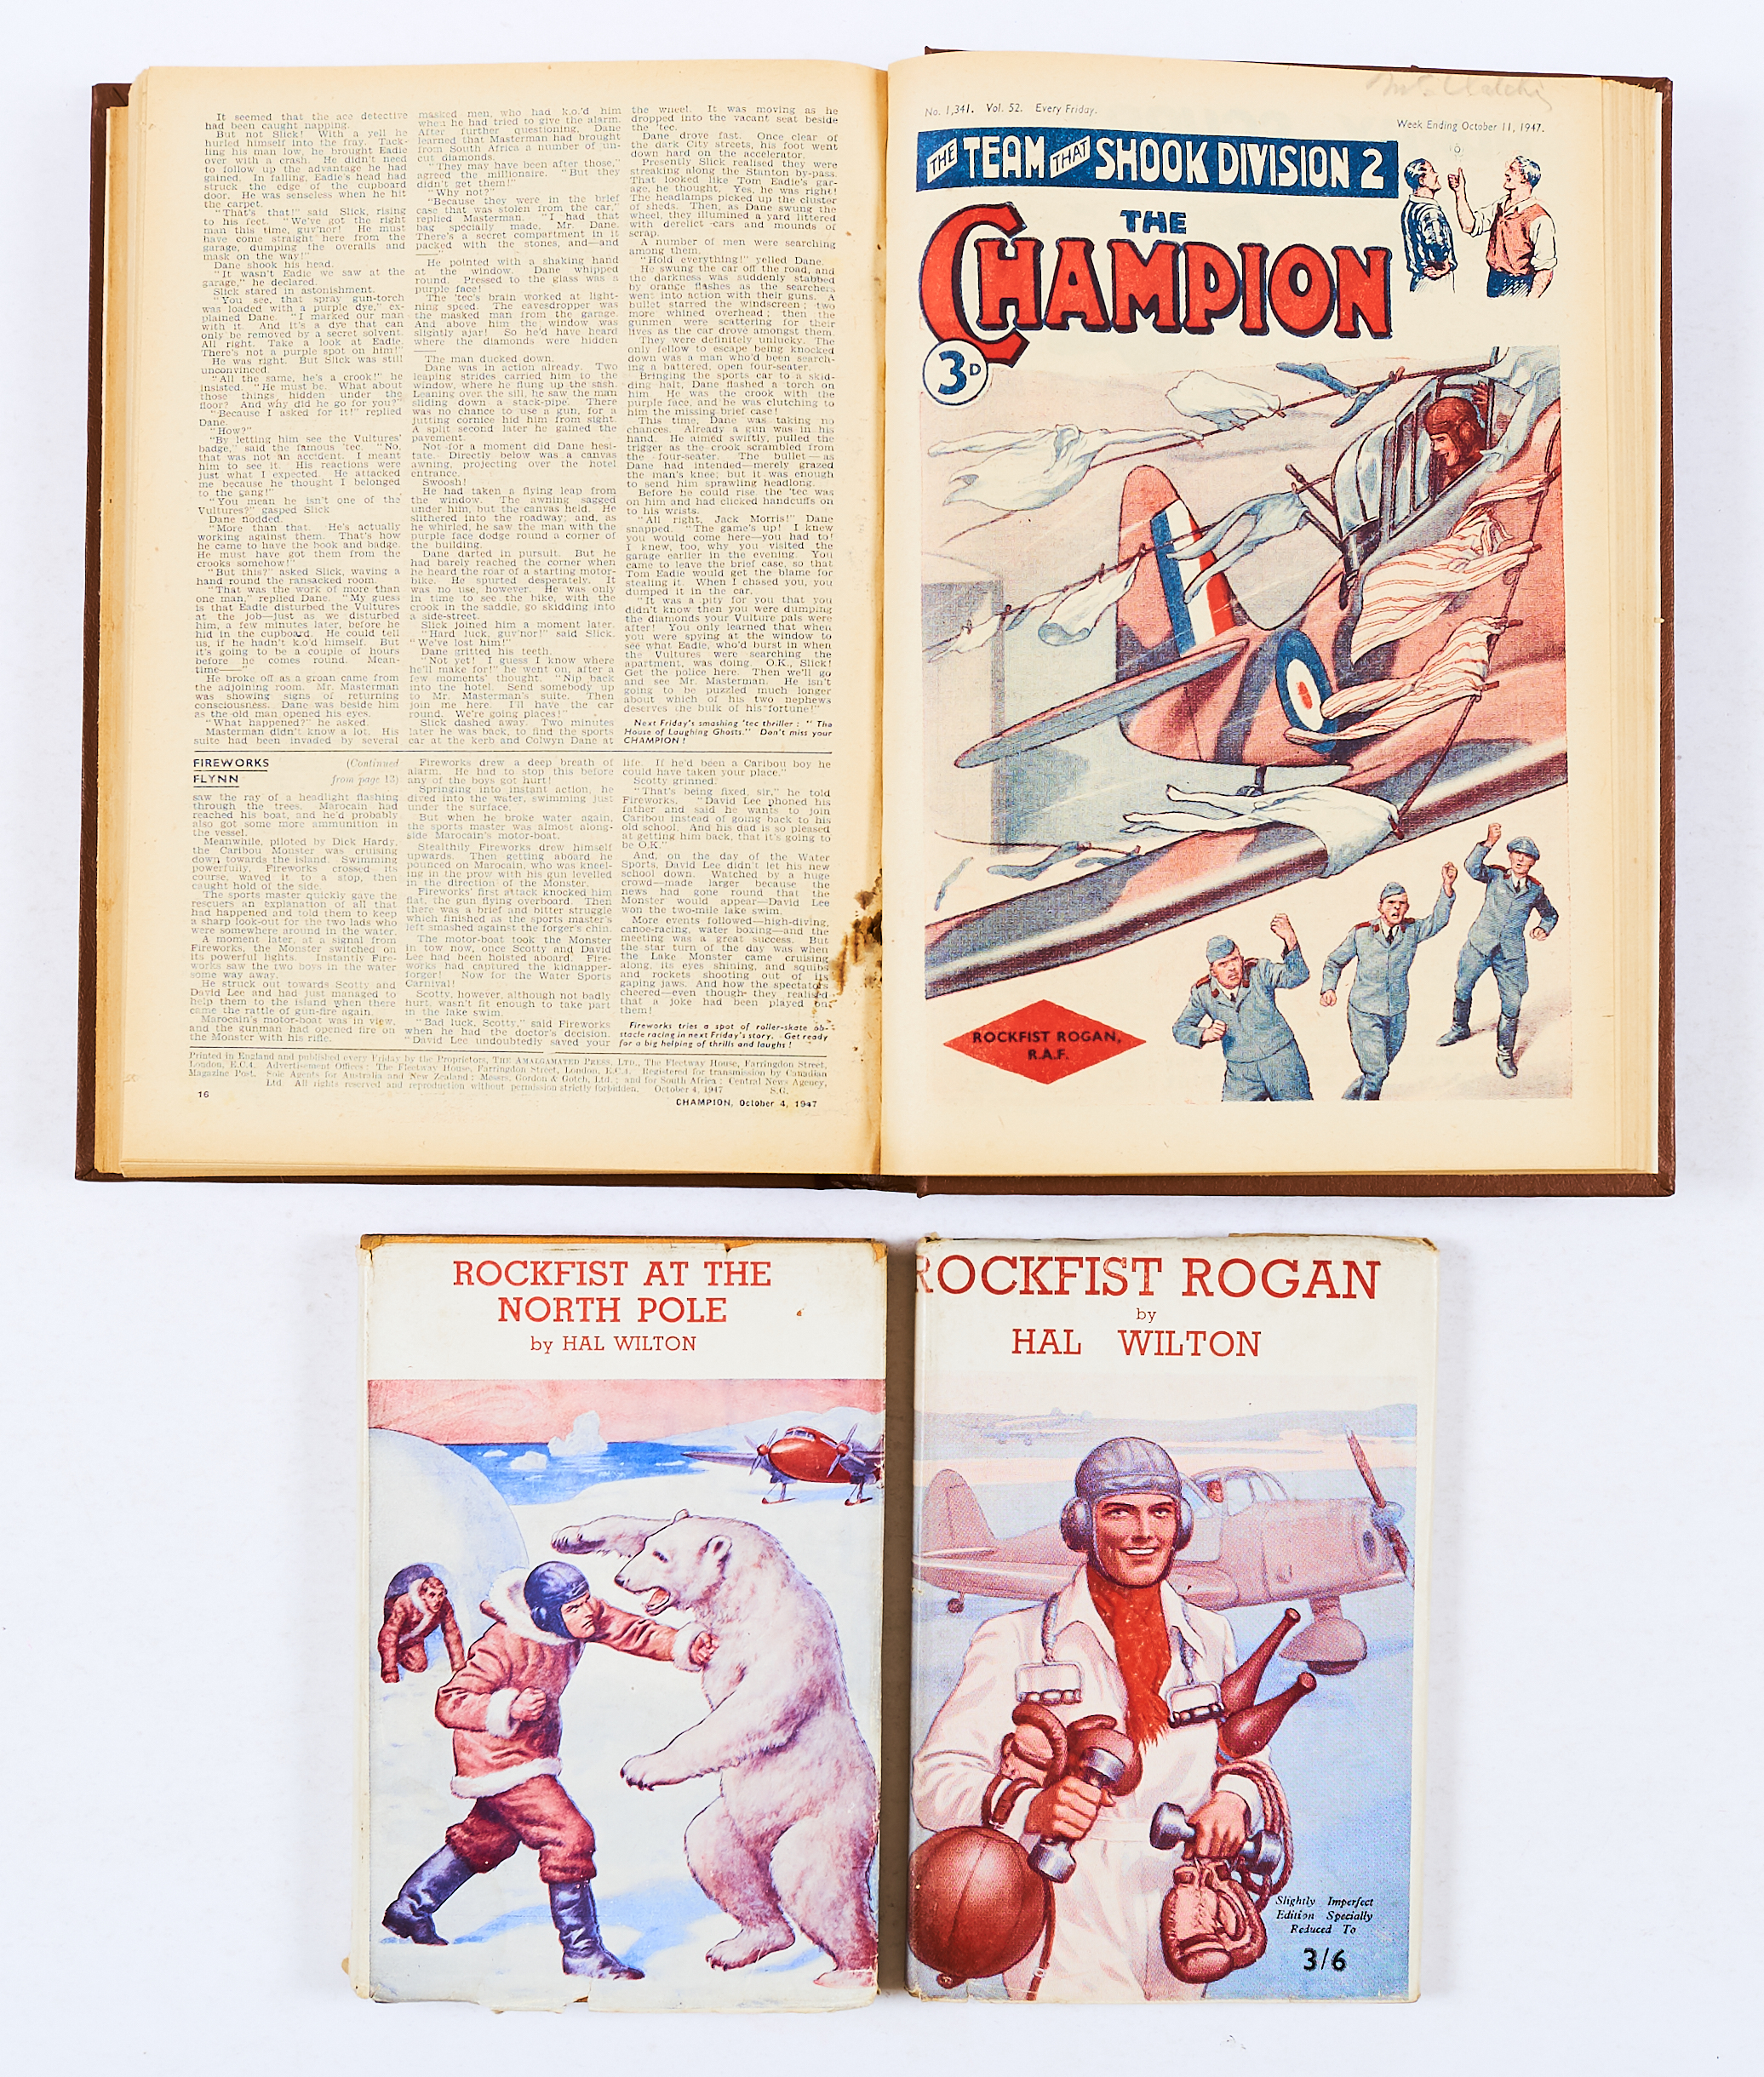 Lot 40 - Champion (1947) 1301-1352. Complete year in bound volume. Starring Rockfist Rogan RAF. A few [vg],